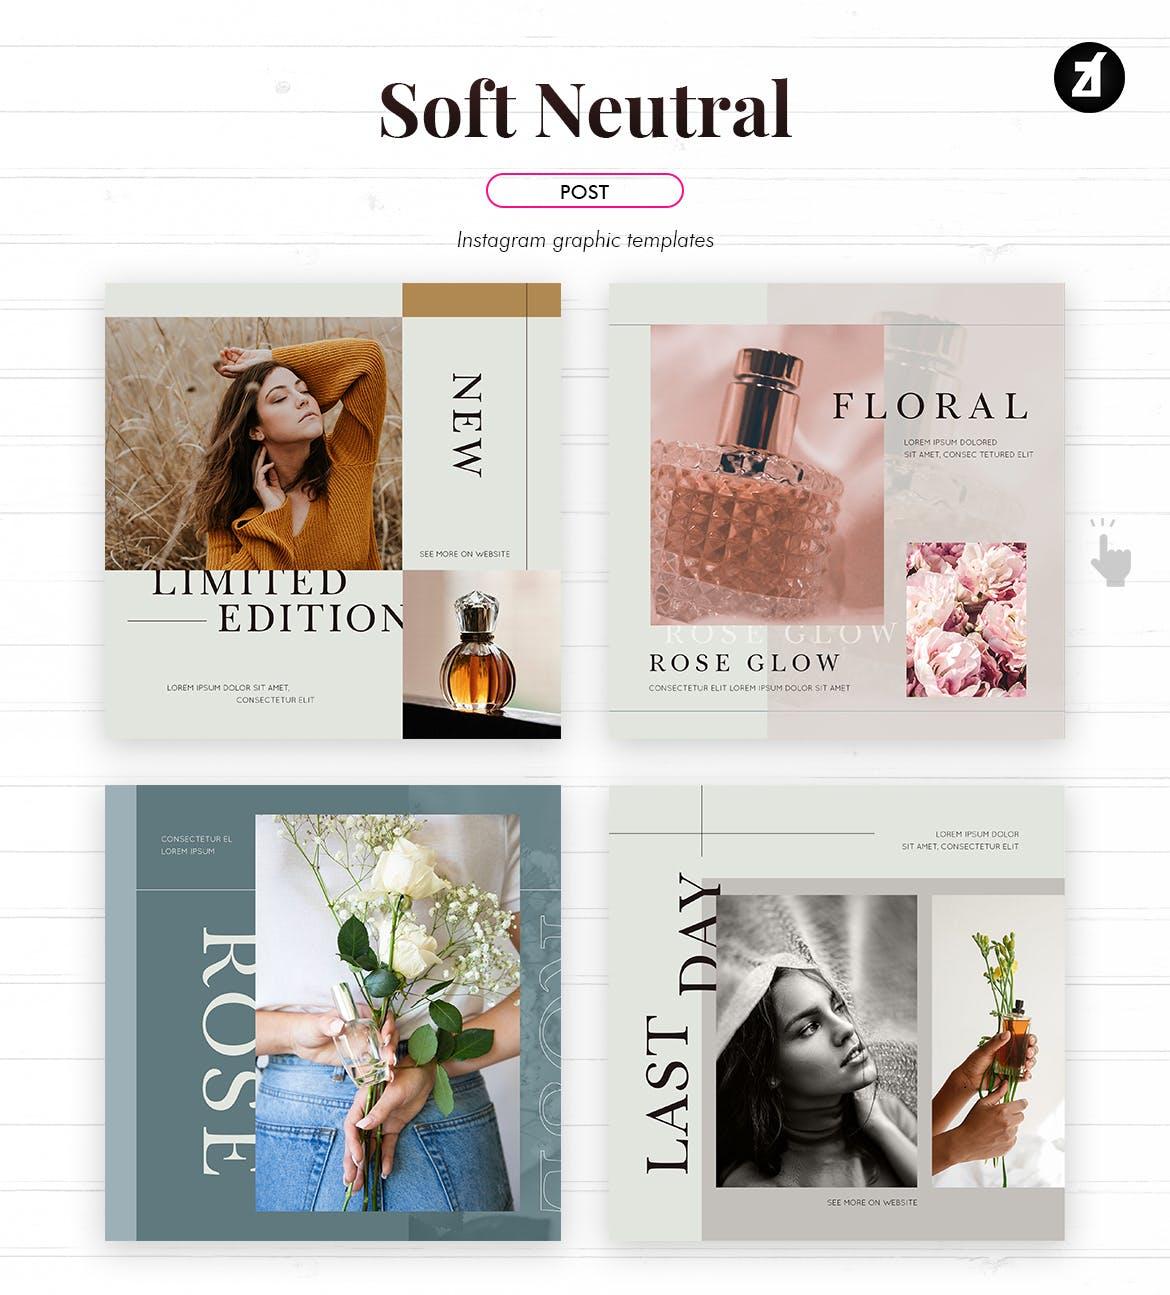 时尚化妆护肤品品牌推广新媒体电商海报模板 Soft Neutral Social Media Graphic Templates插图1